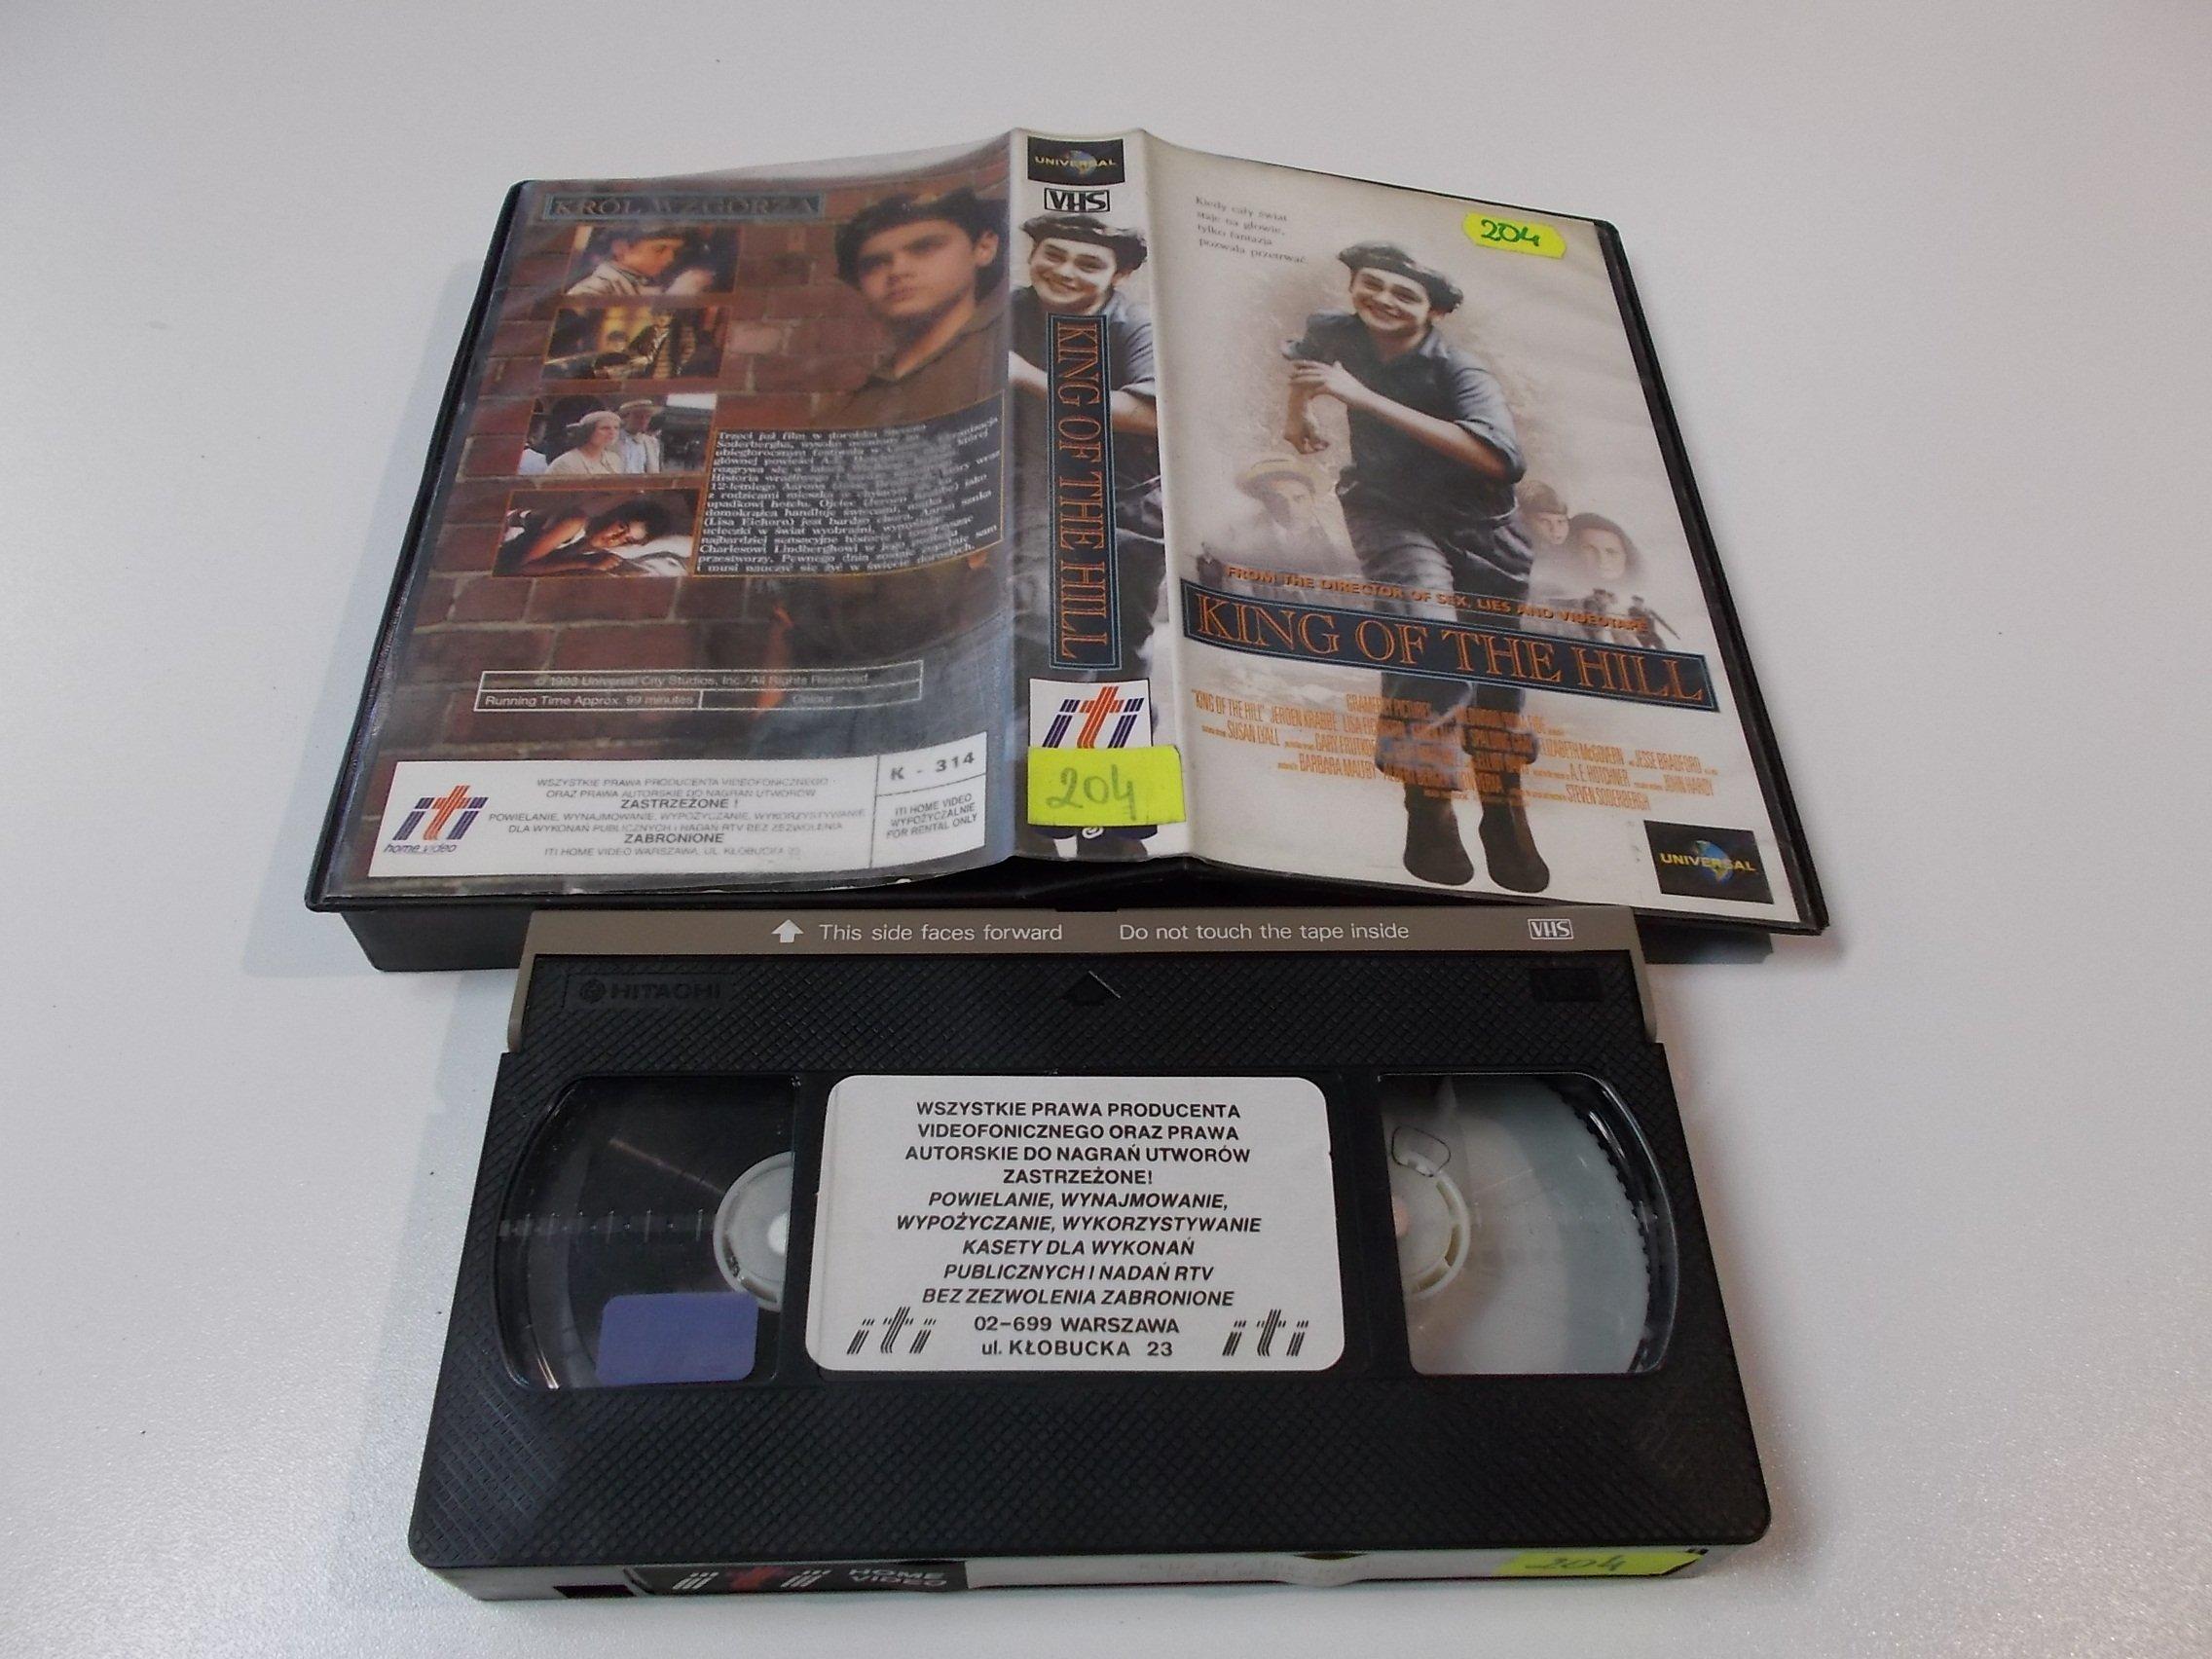 KRÓL WZGÓRZA - Kaseta Video VHS - Opole 1537